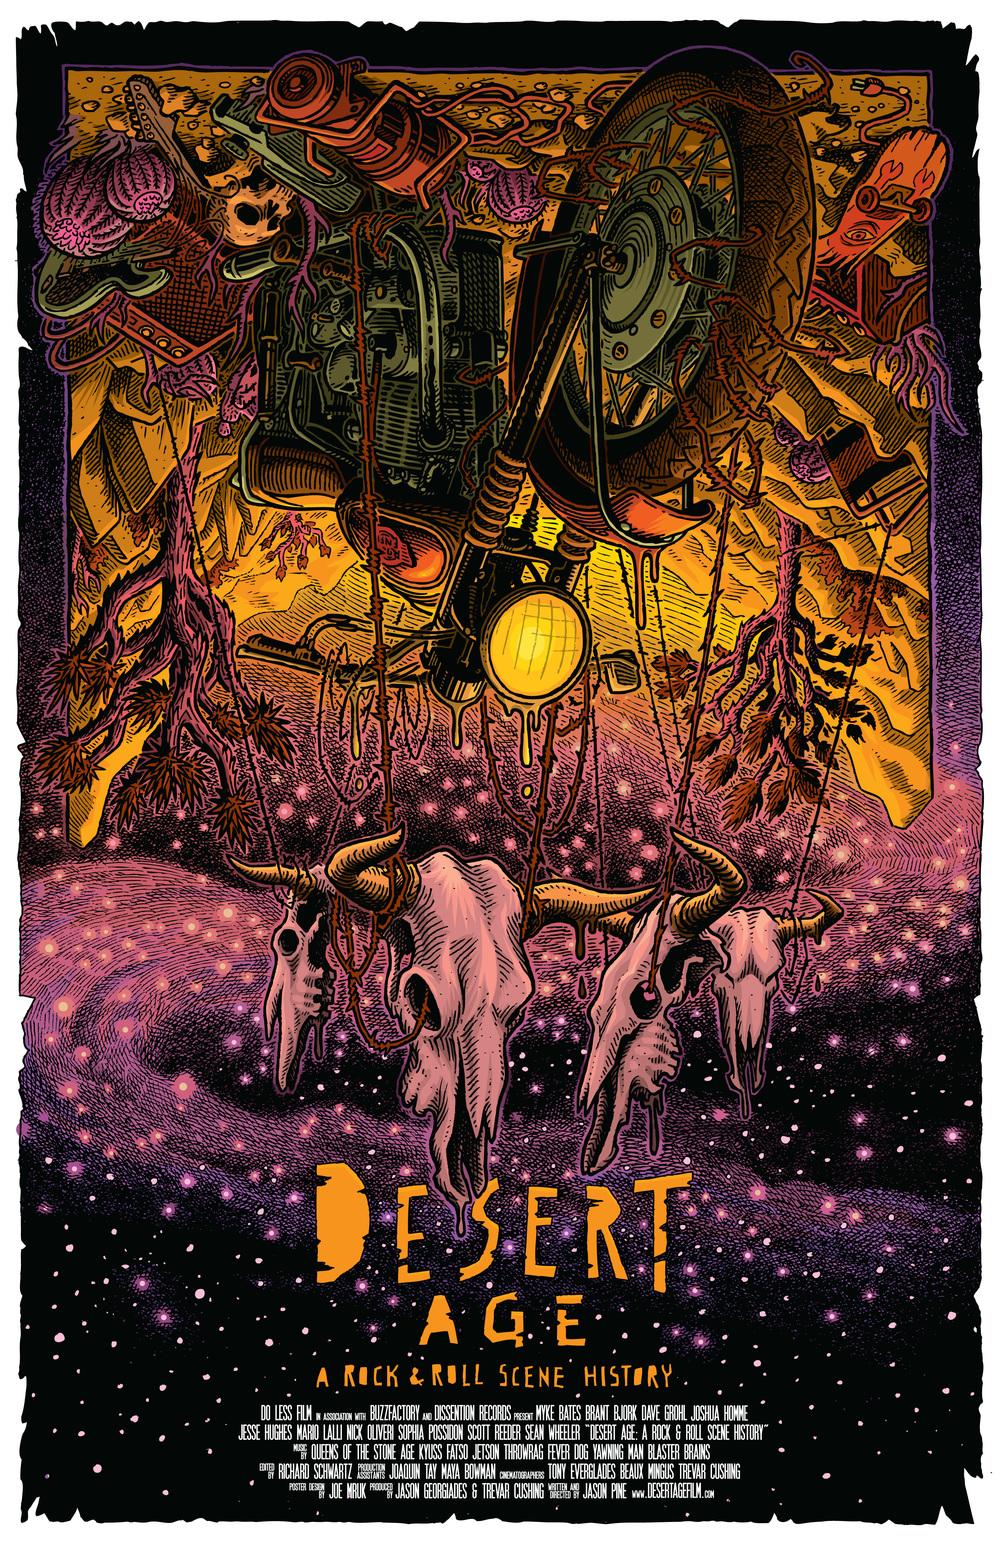 Joe Mruk - Desert Age : A Rock 'n Roll Scene History